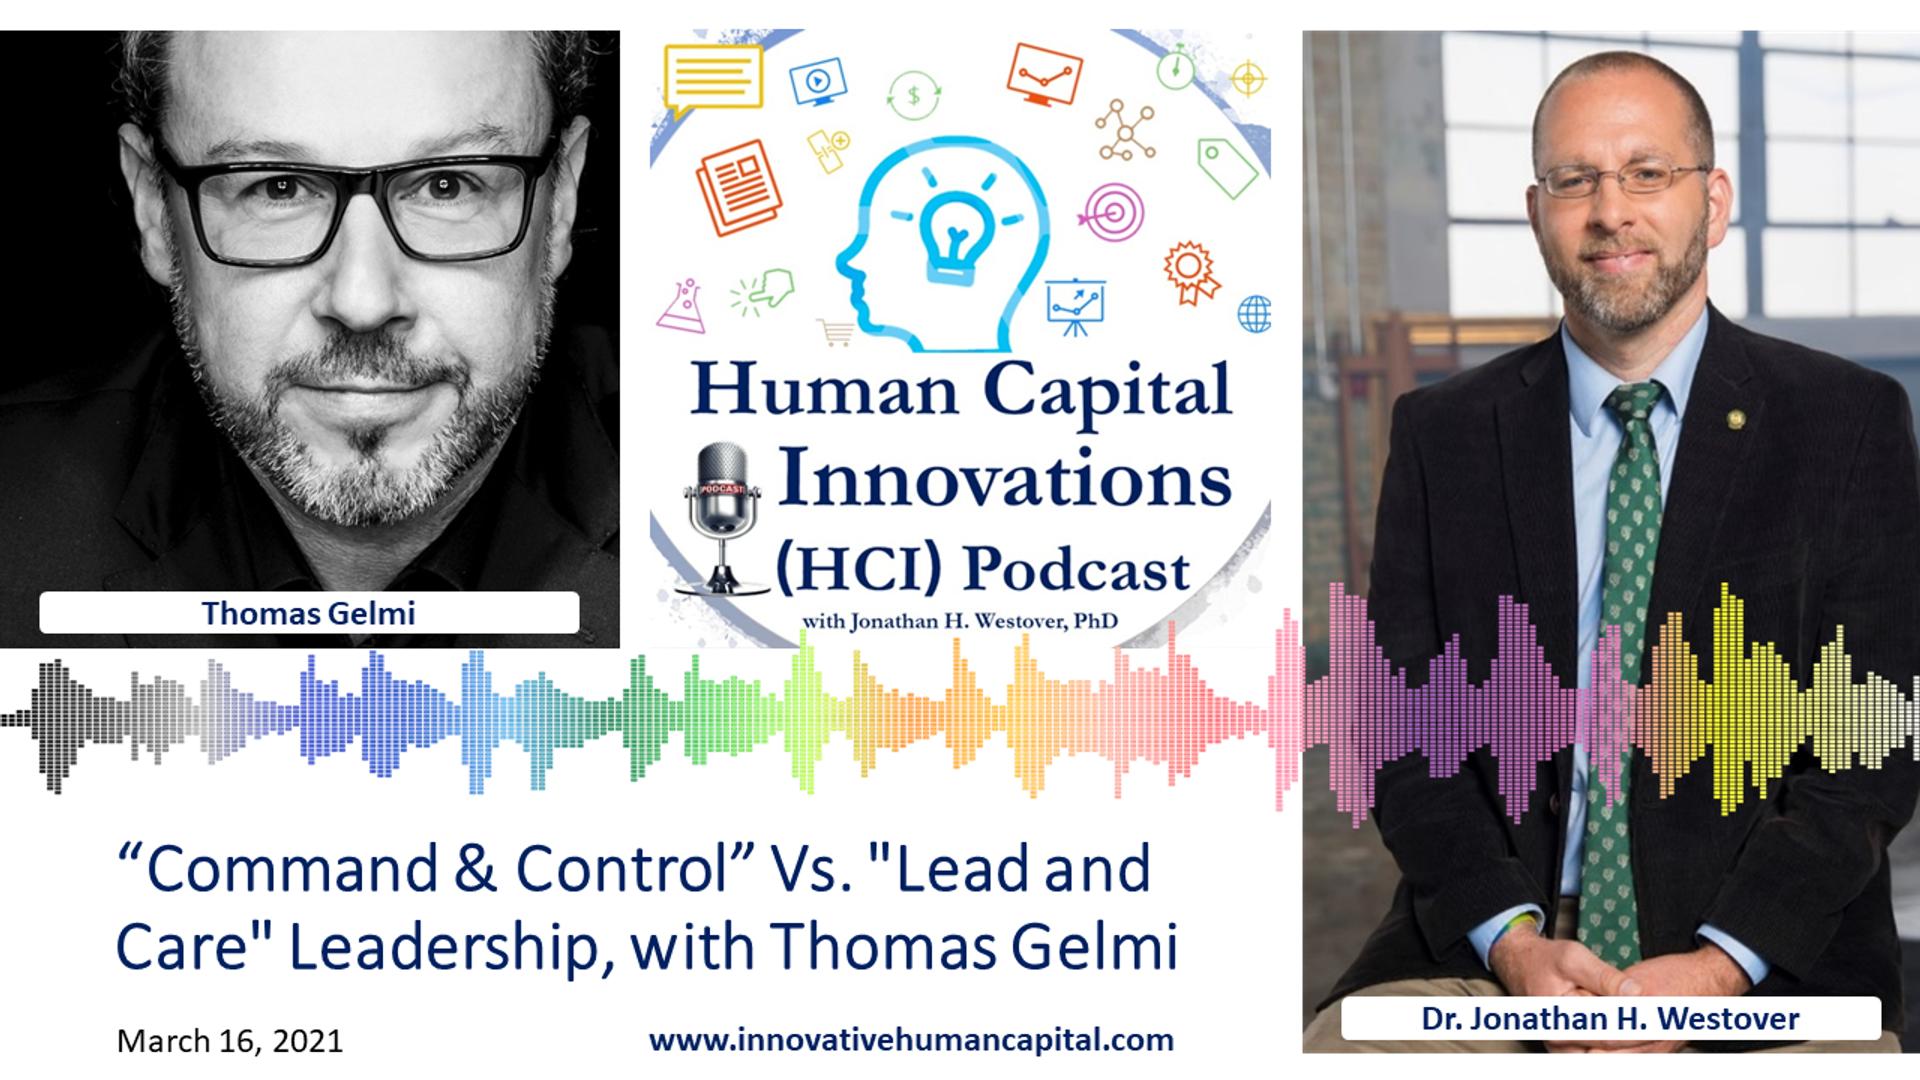 """Command & Control"" vs. ""Lead and Care"" Leadership"